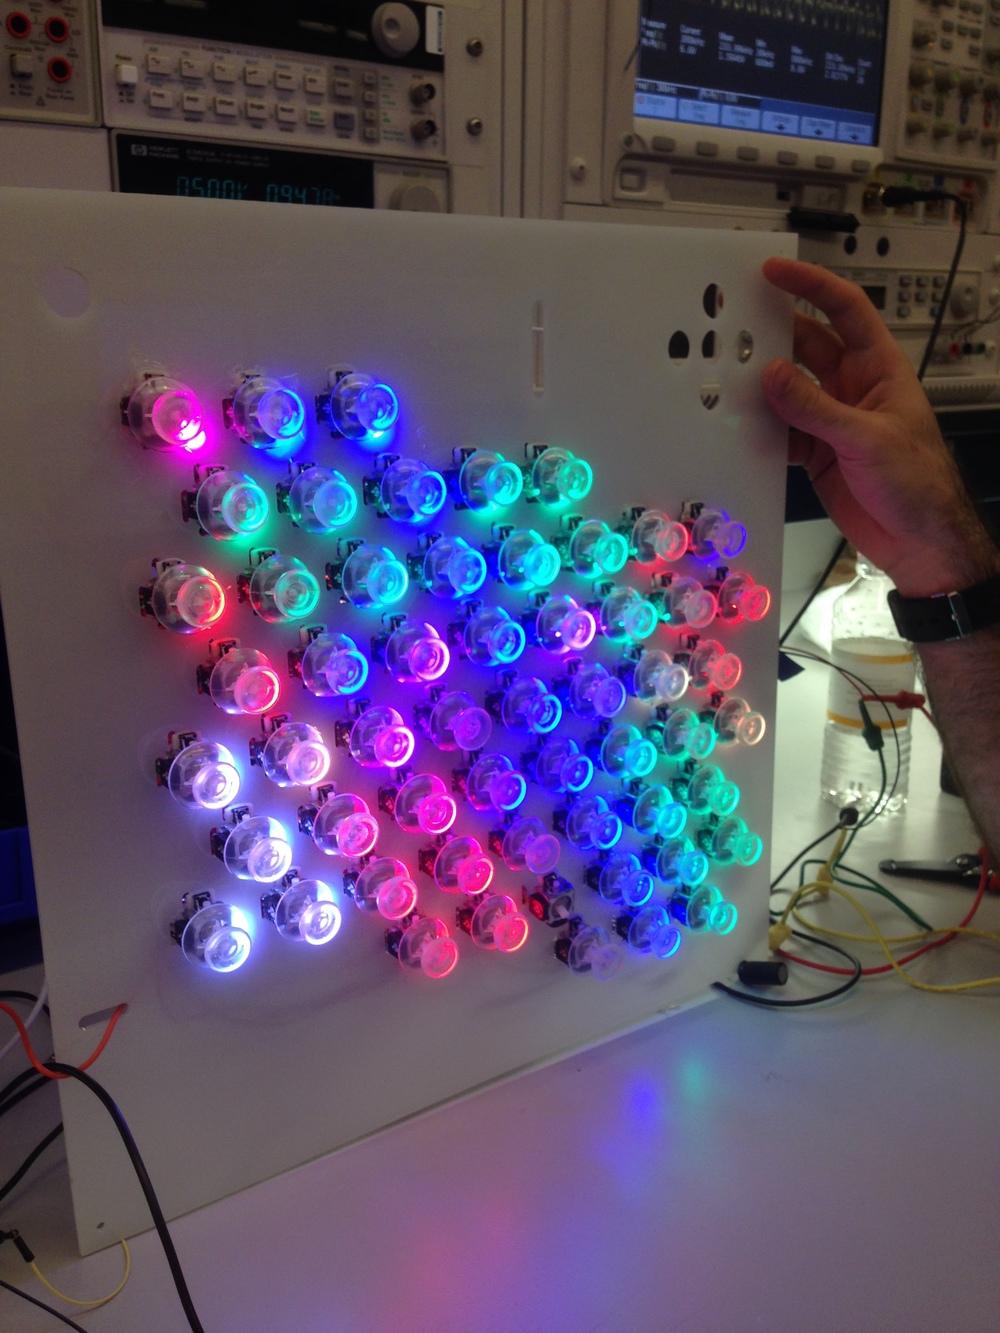 Testing the lights